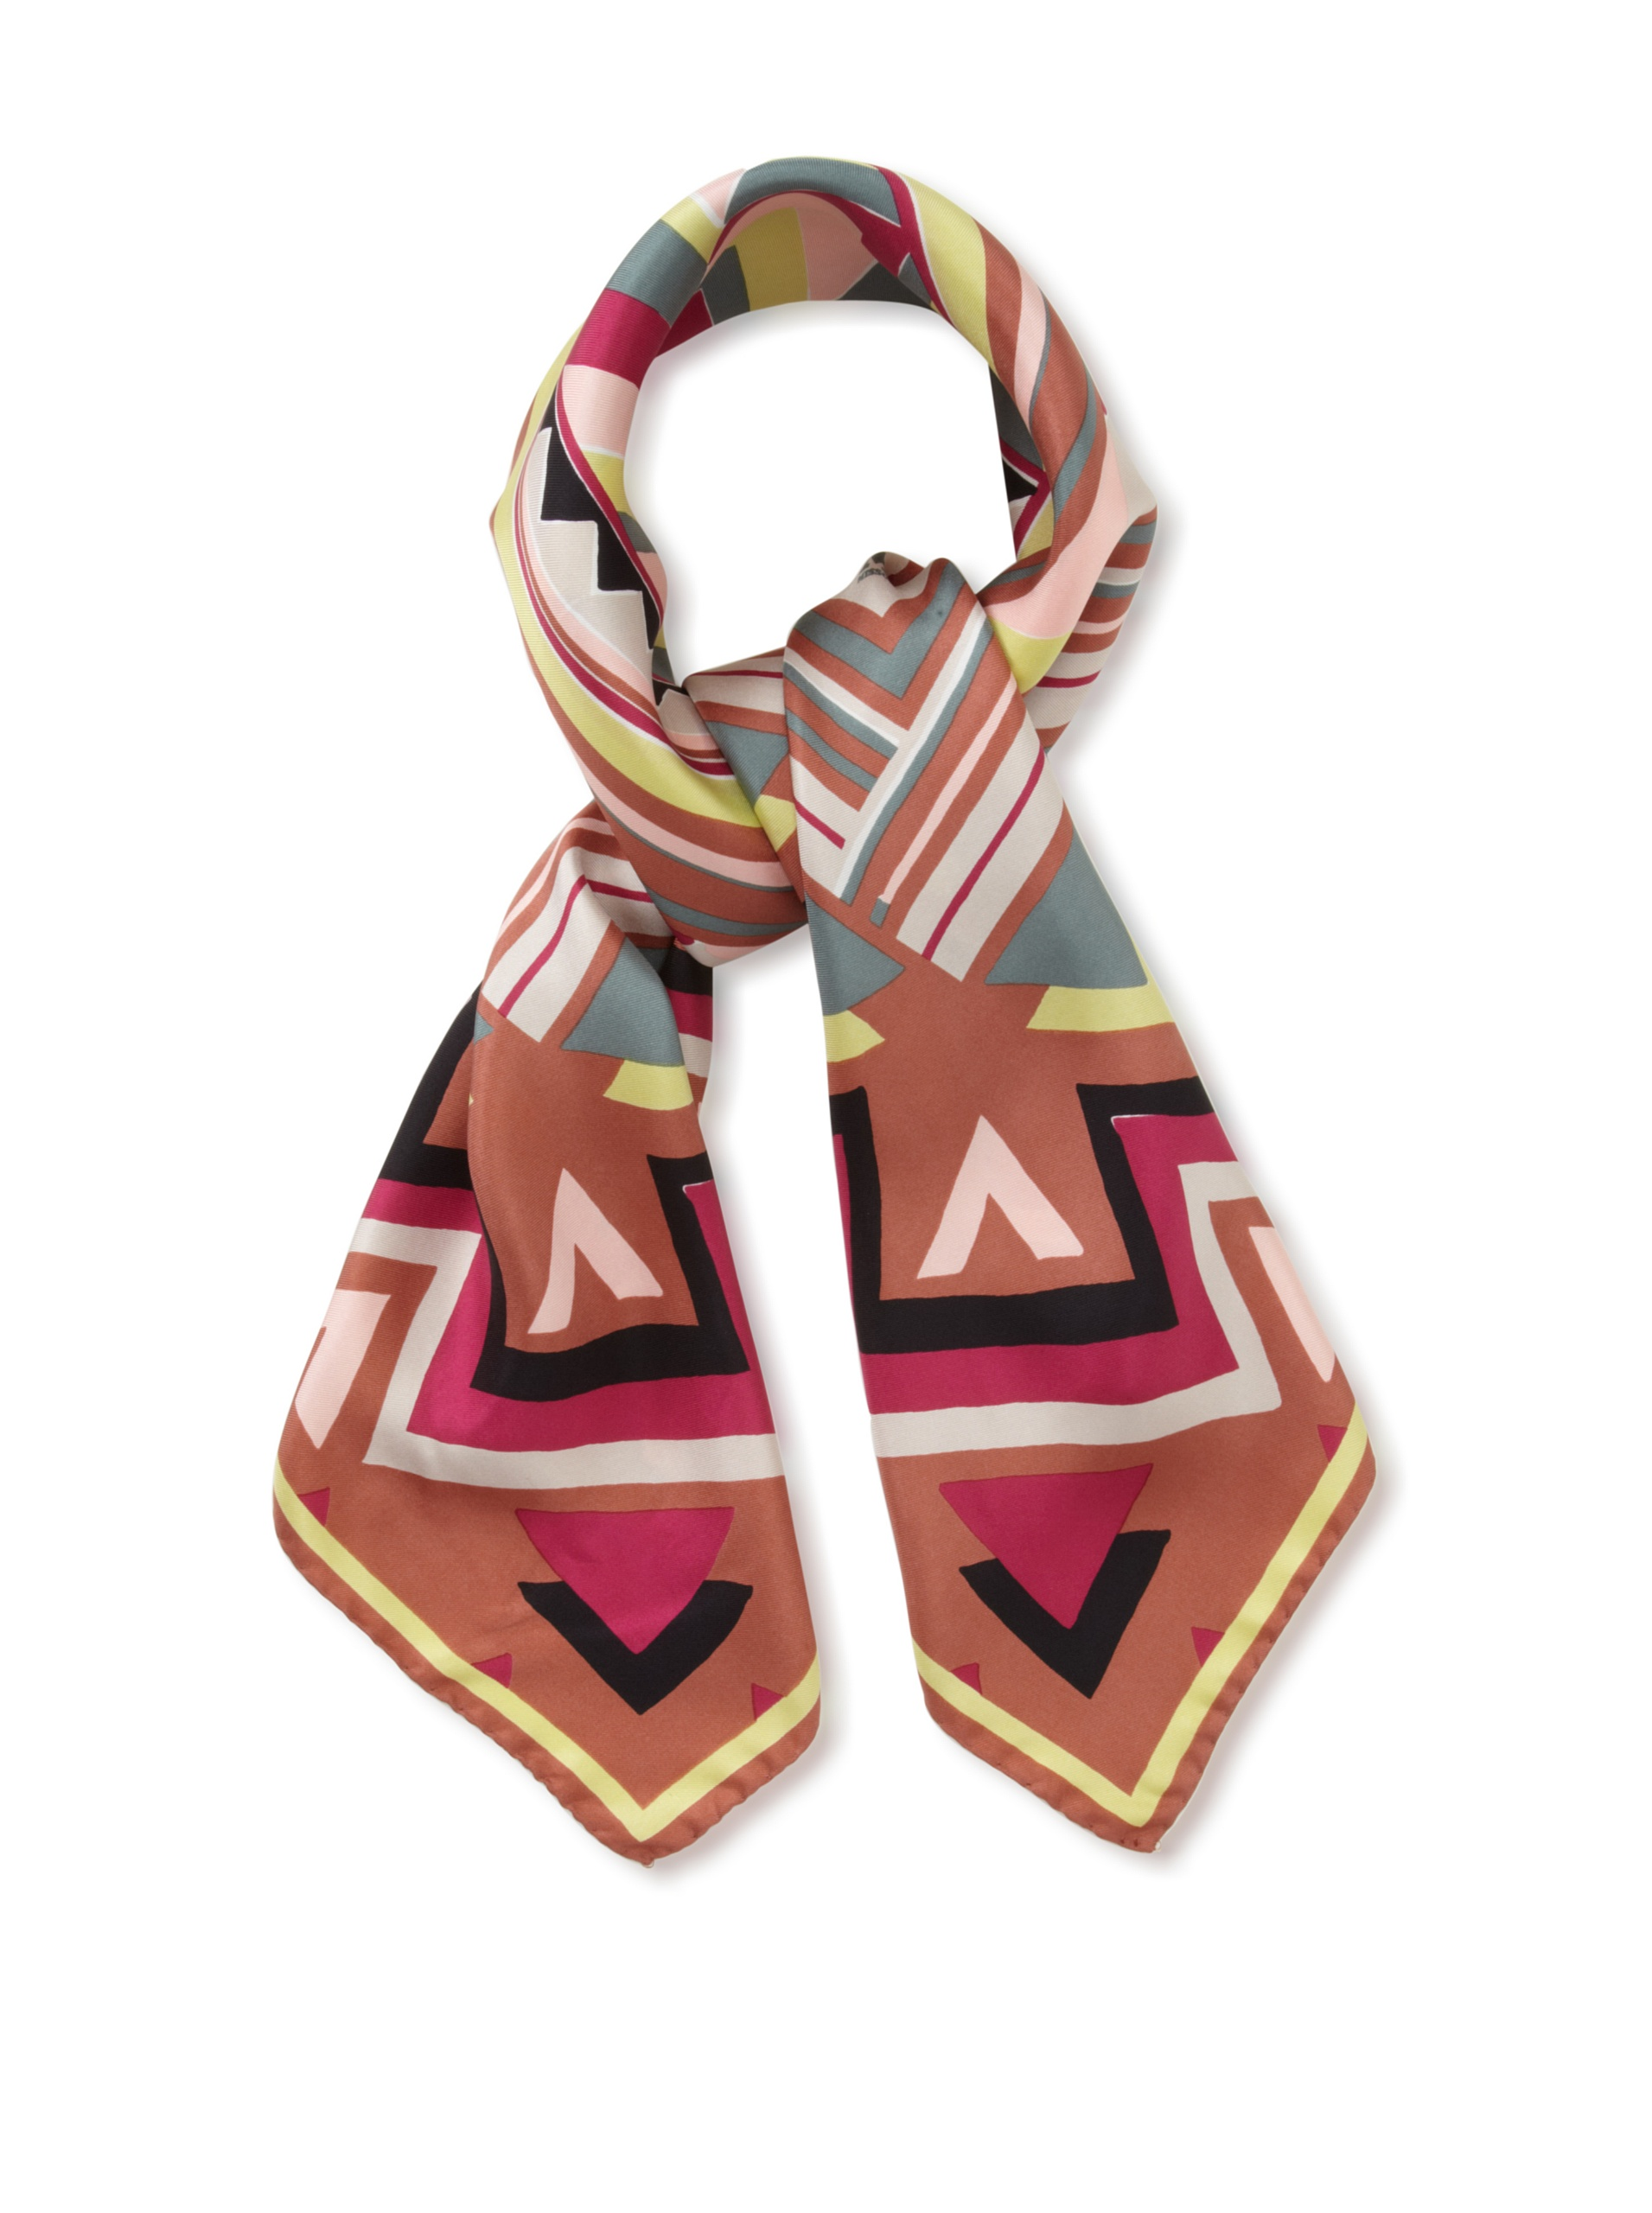 M Missoni Women's Zig-Zag Silk Scarf, Multicolored Brown, One Size